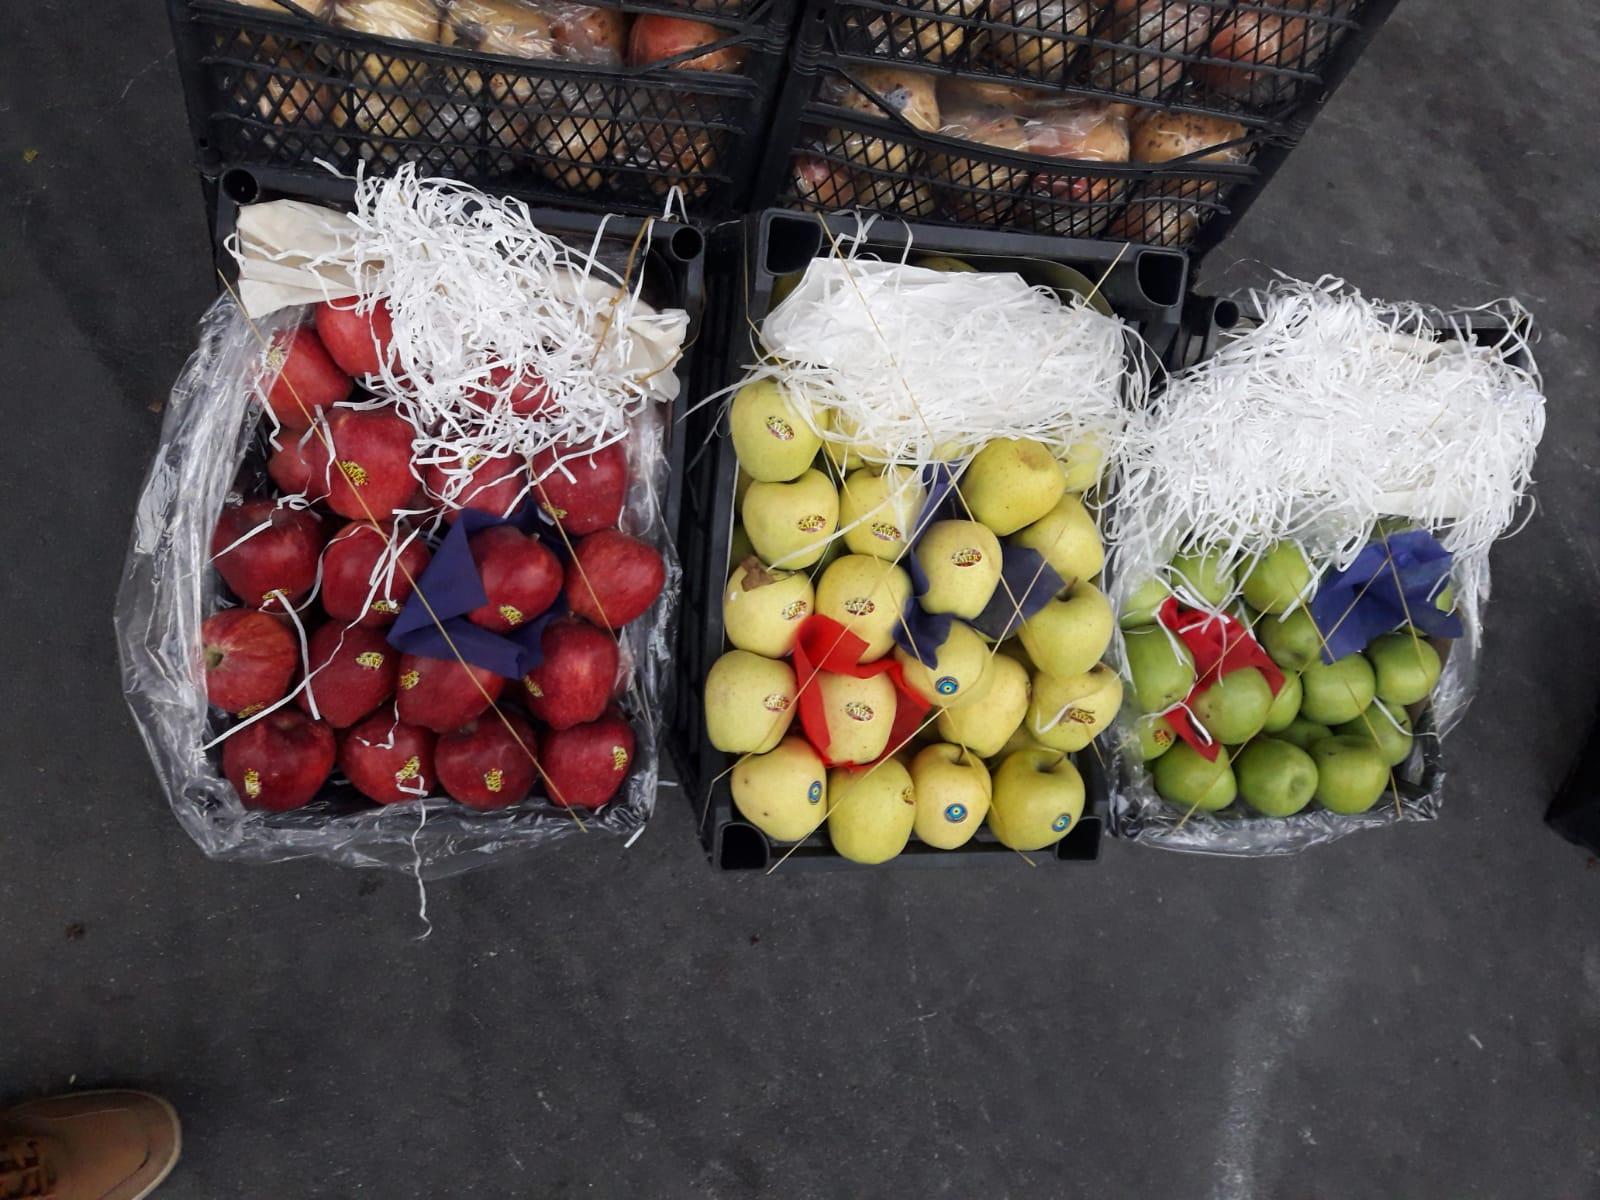 Fresh Turkish Apples